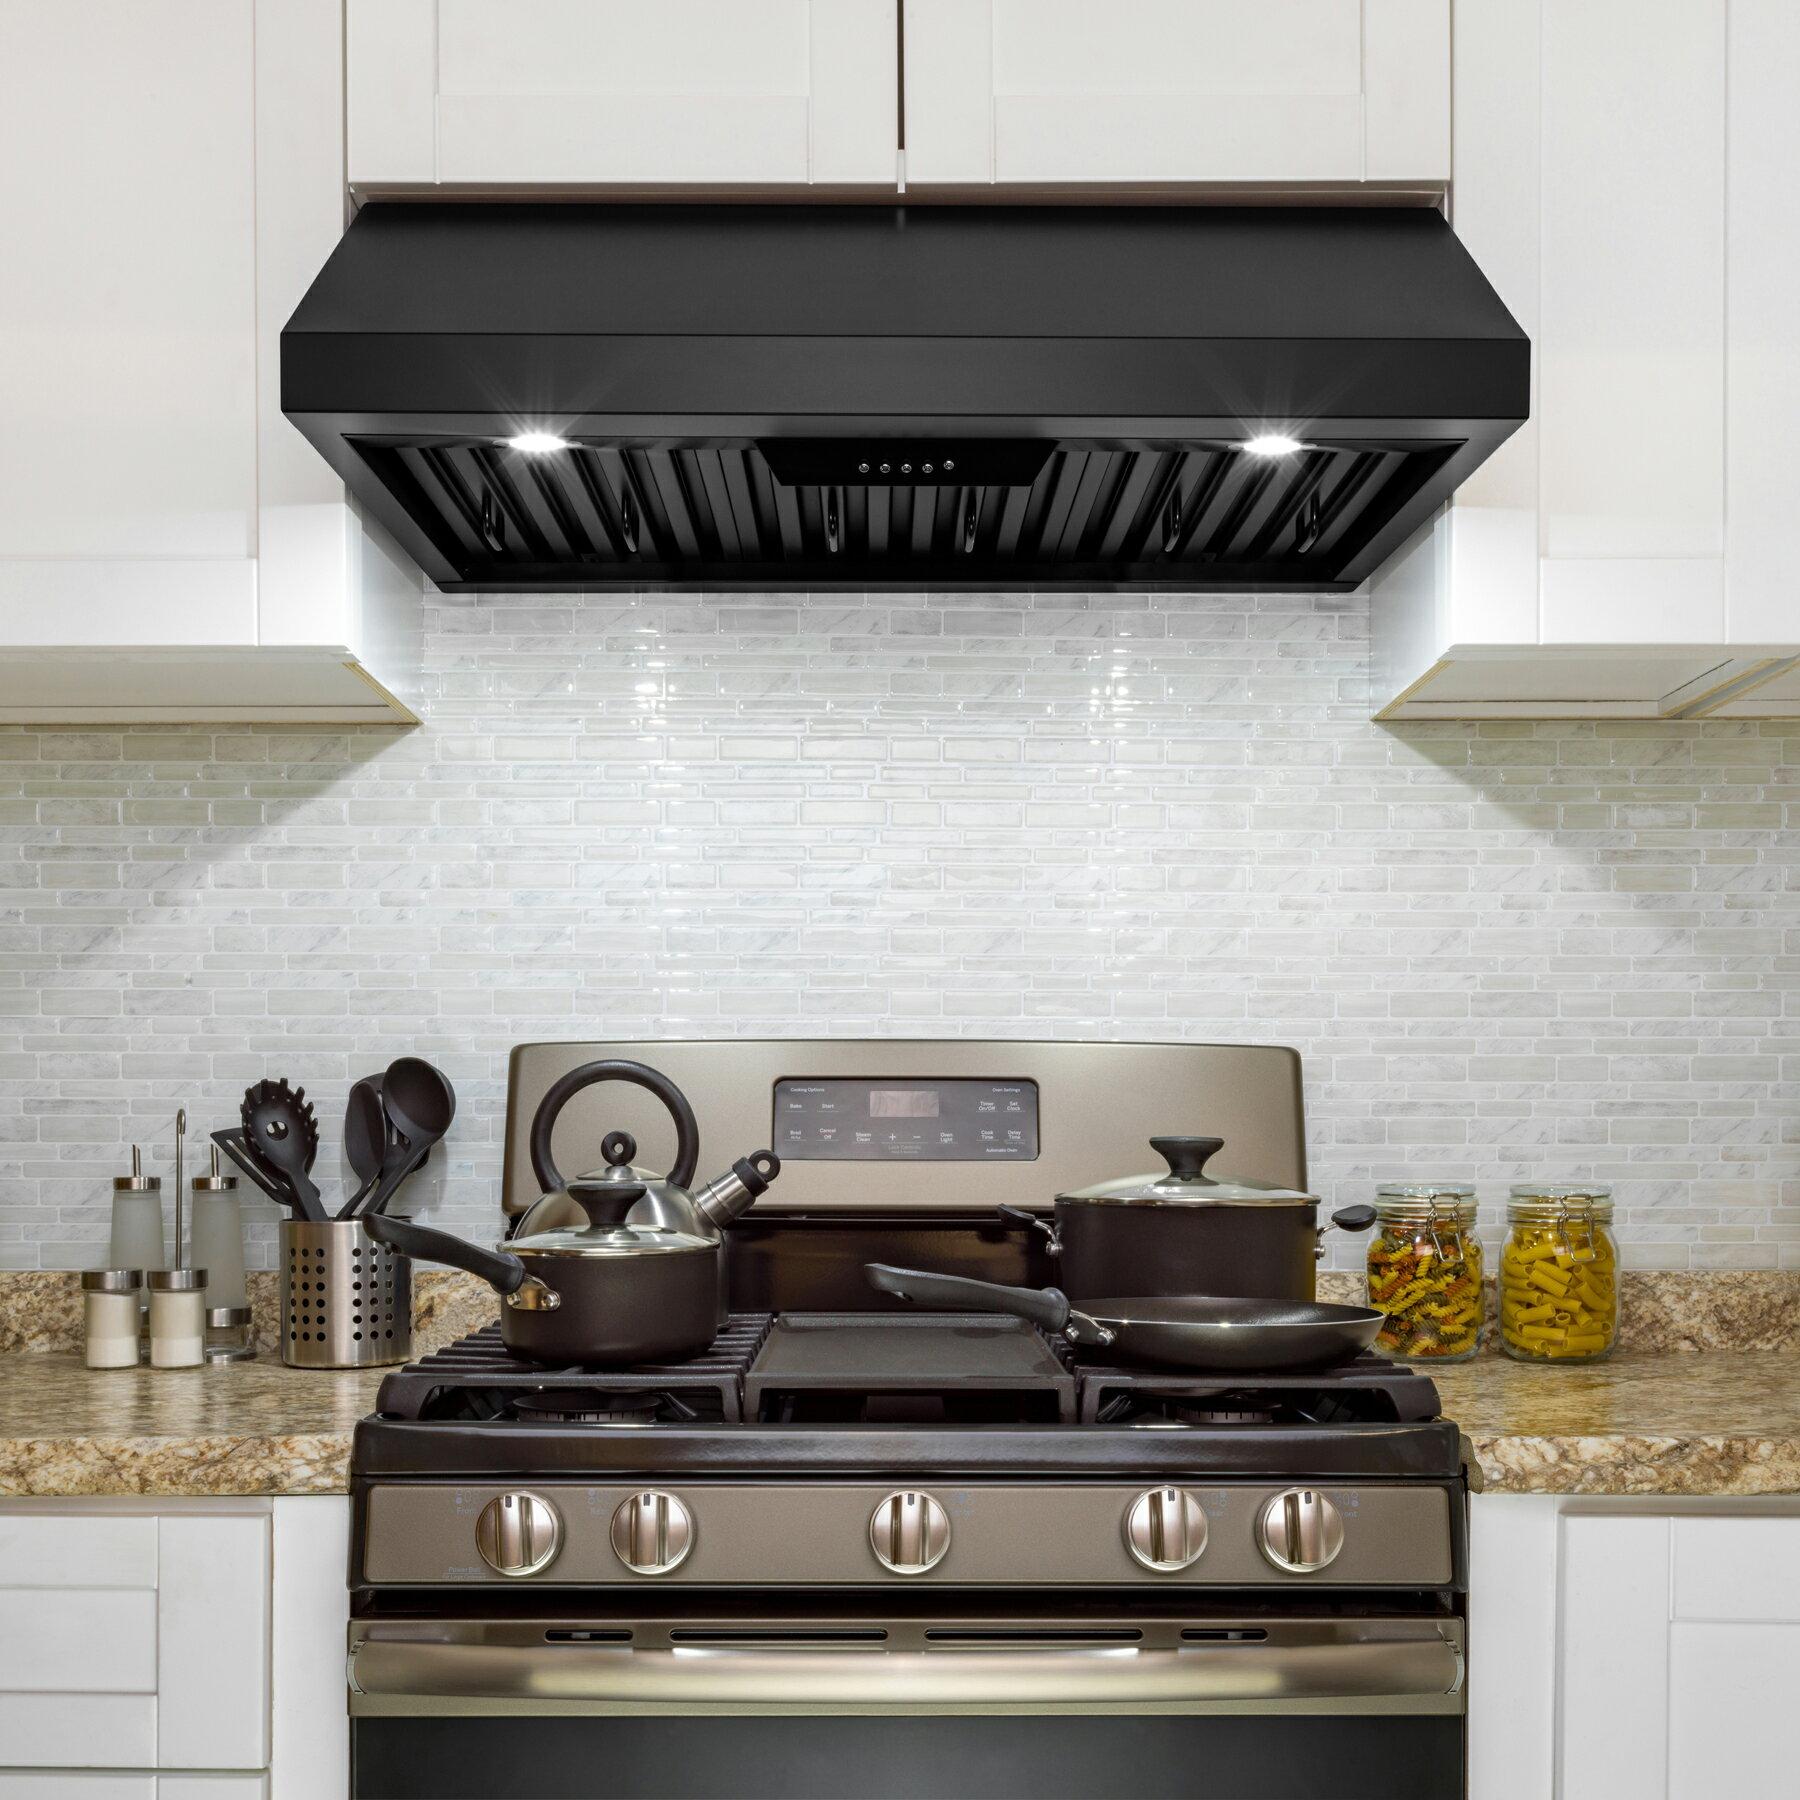 Kitchen Exhaust Fan Design: AKDY: AKDY European Style Range Hood